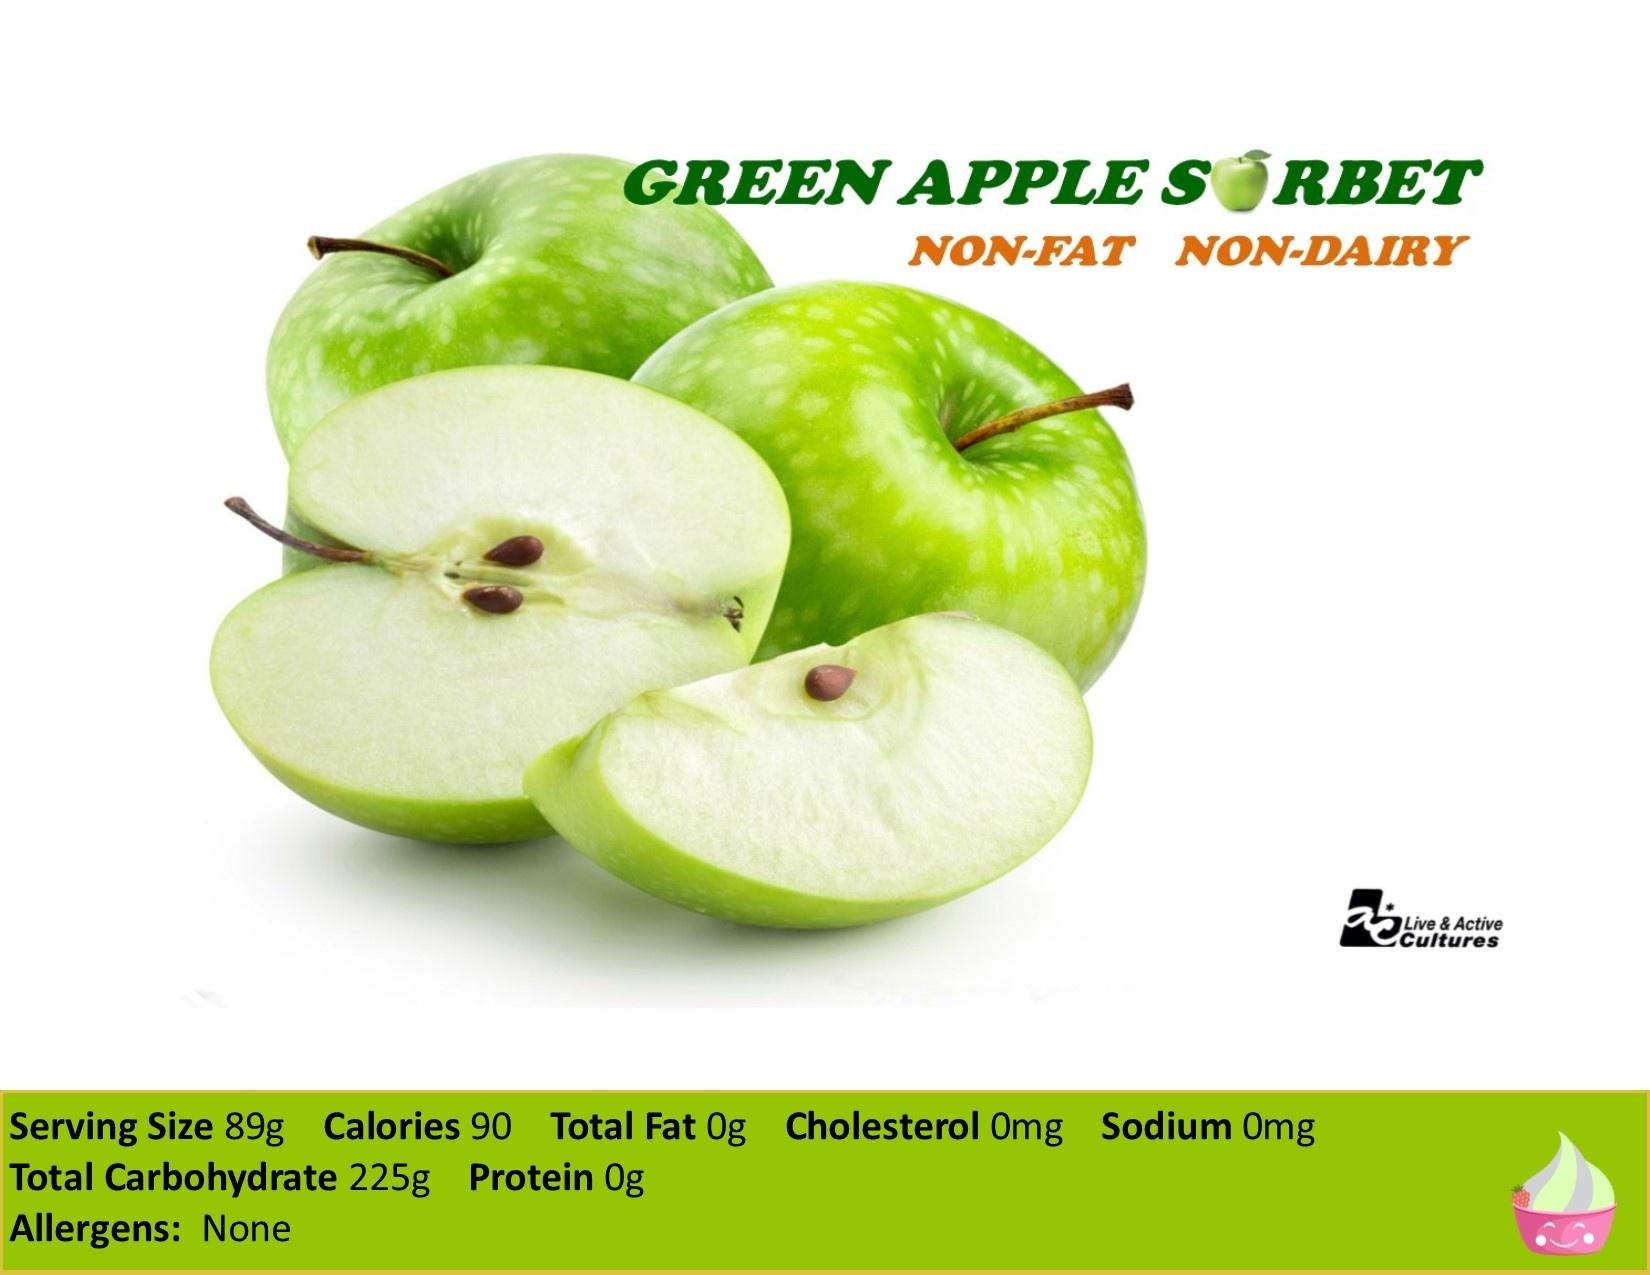 https://0201.nccdn.net/1_2/000/000/0ec/261/Green-Apple-Sorbet-1650x1275-1650x1275.jpg